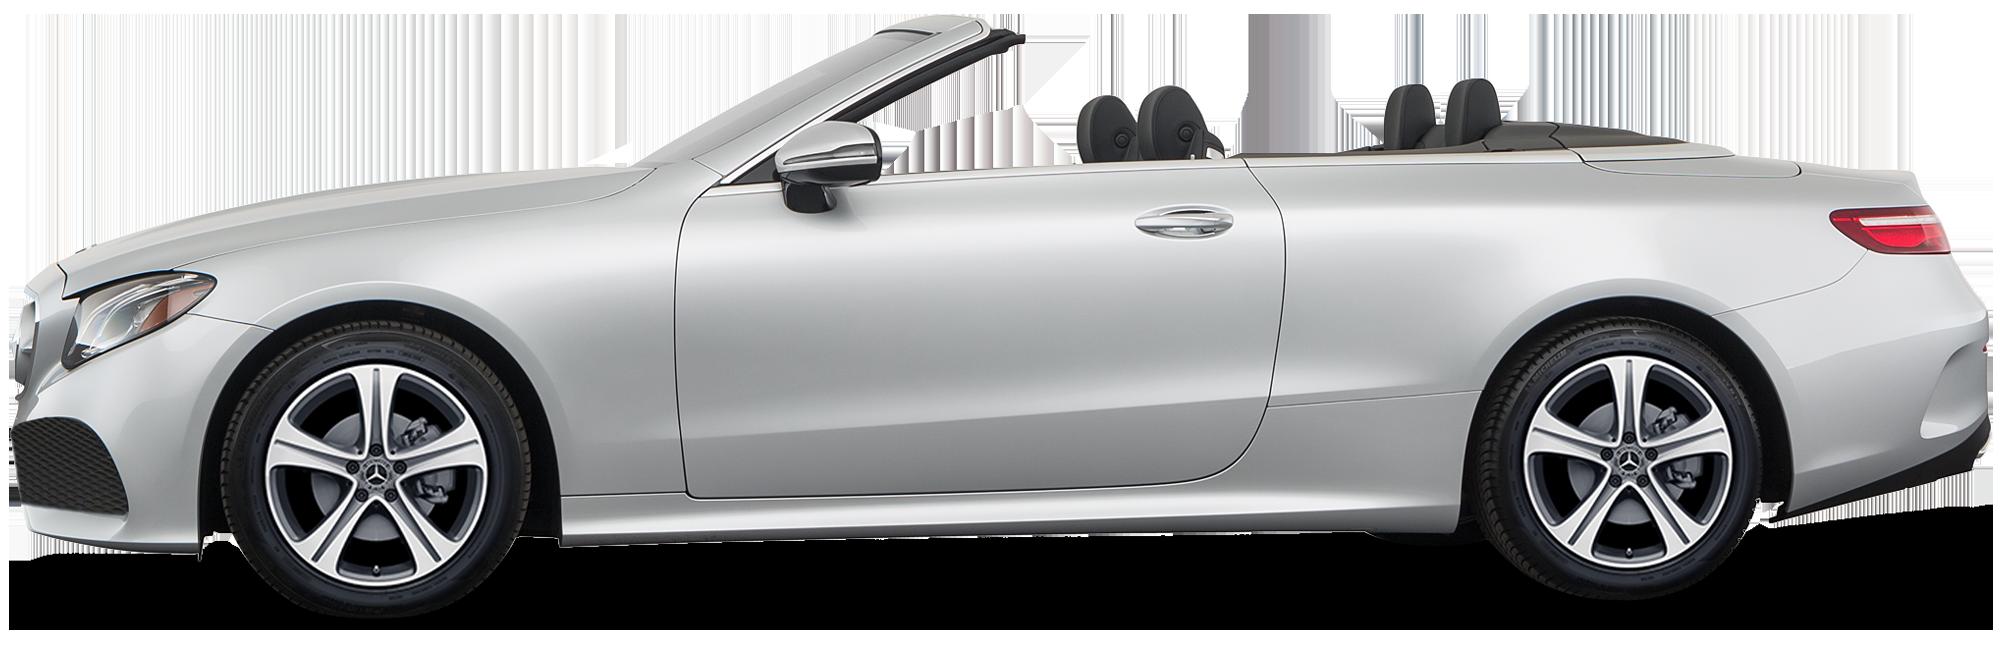 2019 Mercedes-Benz E-Class Cabriolet E 450 4MATIC